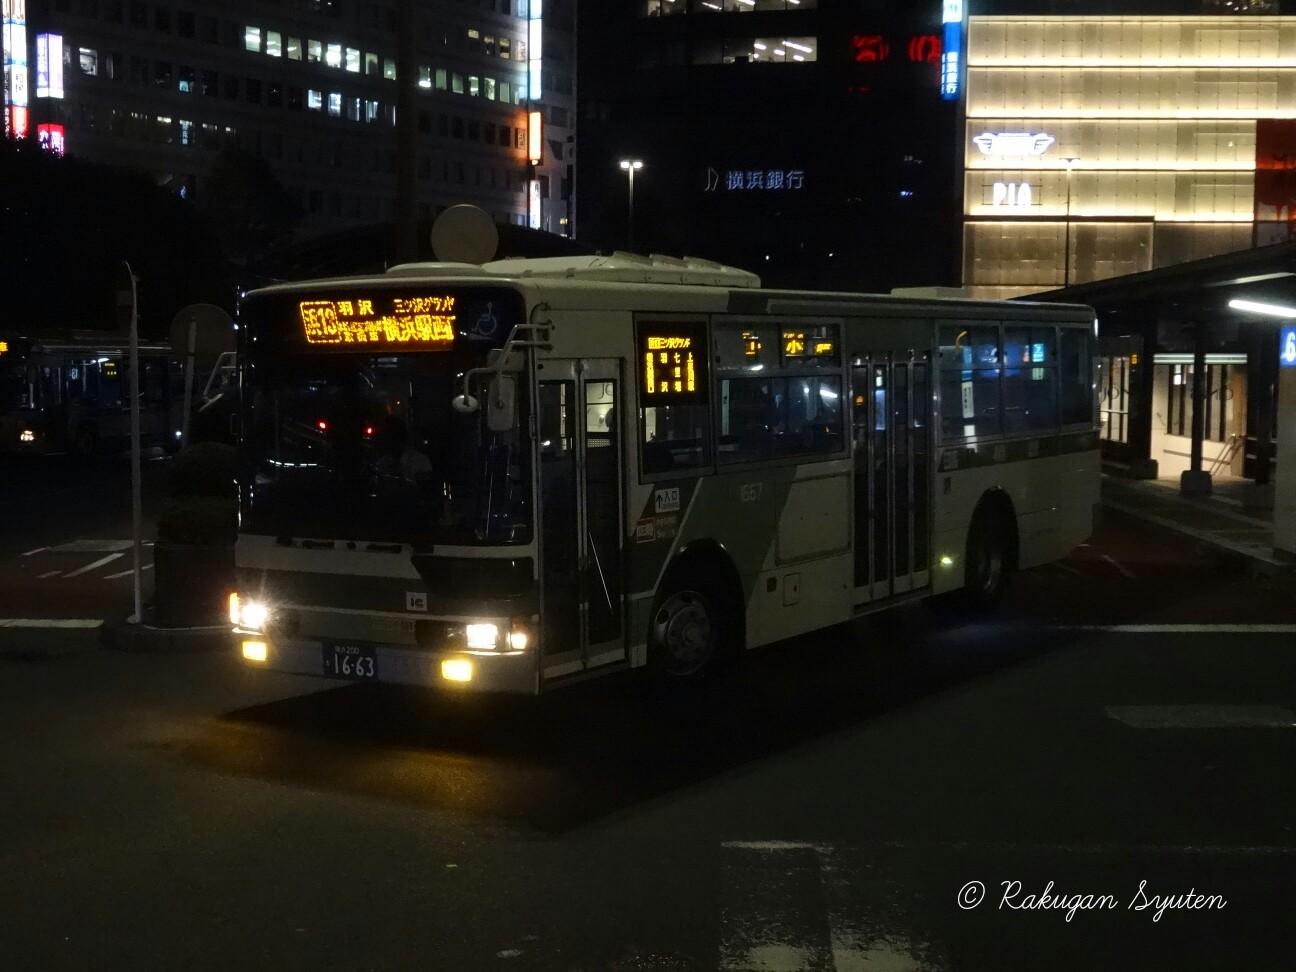 f:id:OkitsuPier:20160905002857j:image